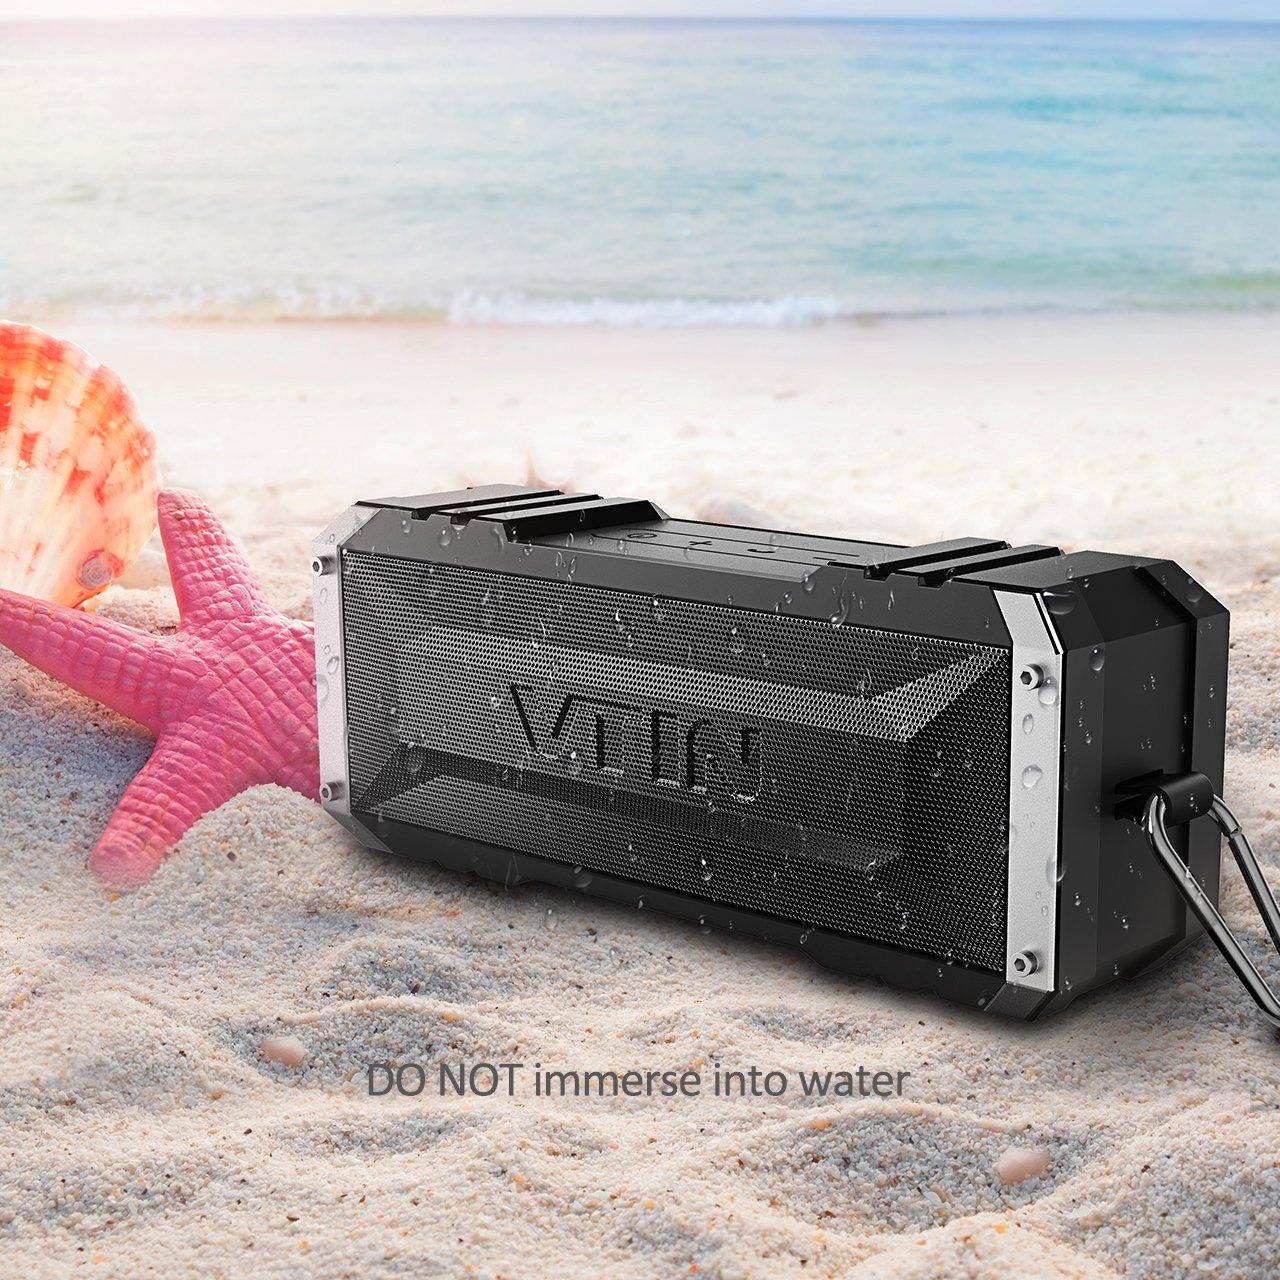 Vtin 20W Outdoor Bluetooth Speaker, Loud Volume, 30 Hours Playtime Portable Wireless Speaker, Waterproof, Dustproof, Shockproof for Indoor and Outdoor Activities - Shower, Pool, Beach, Car, Home by Vtin (Image #8)